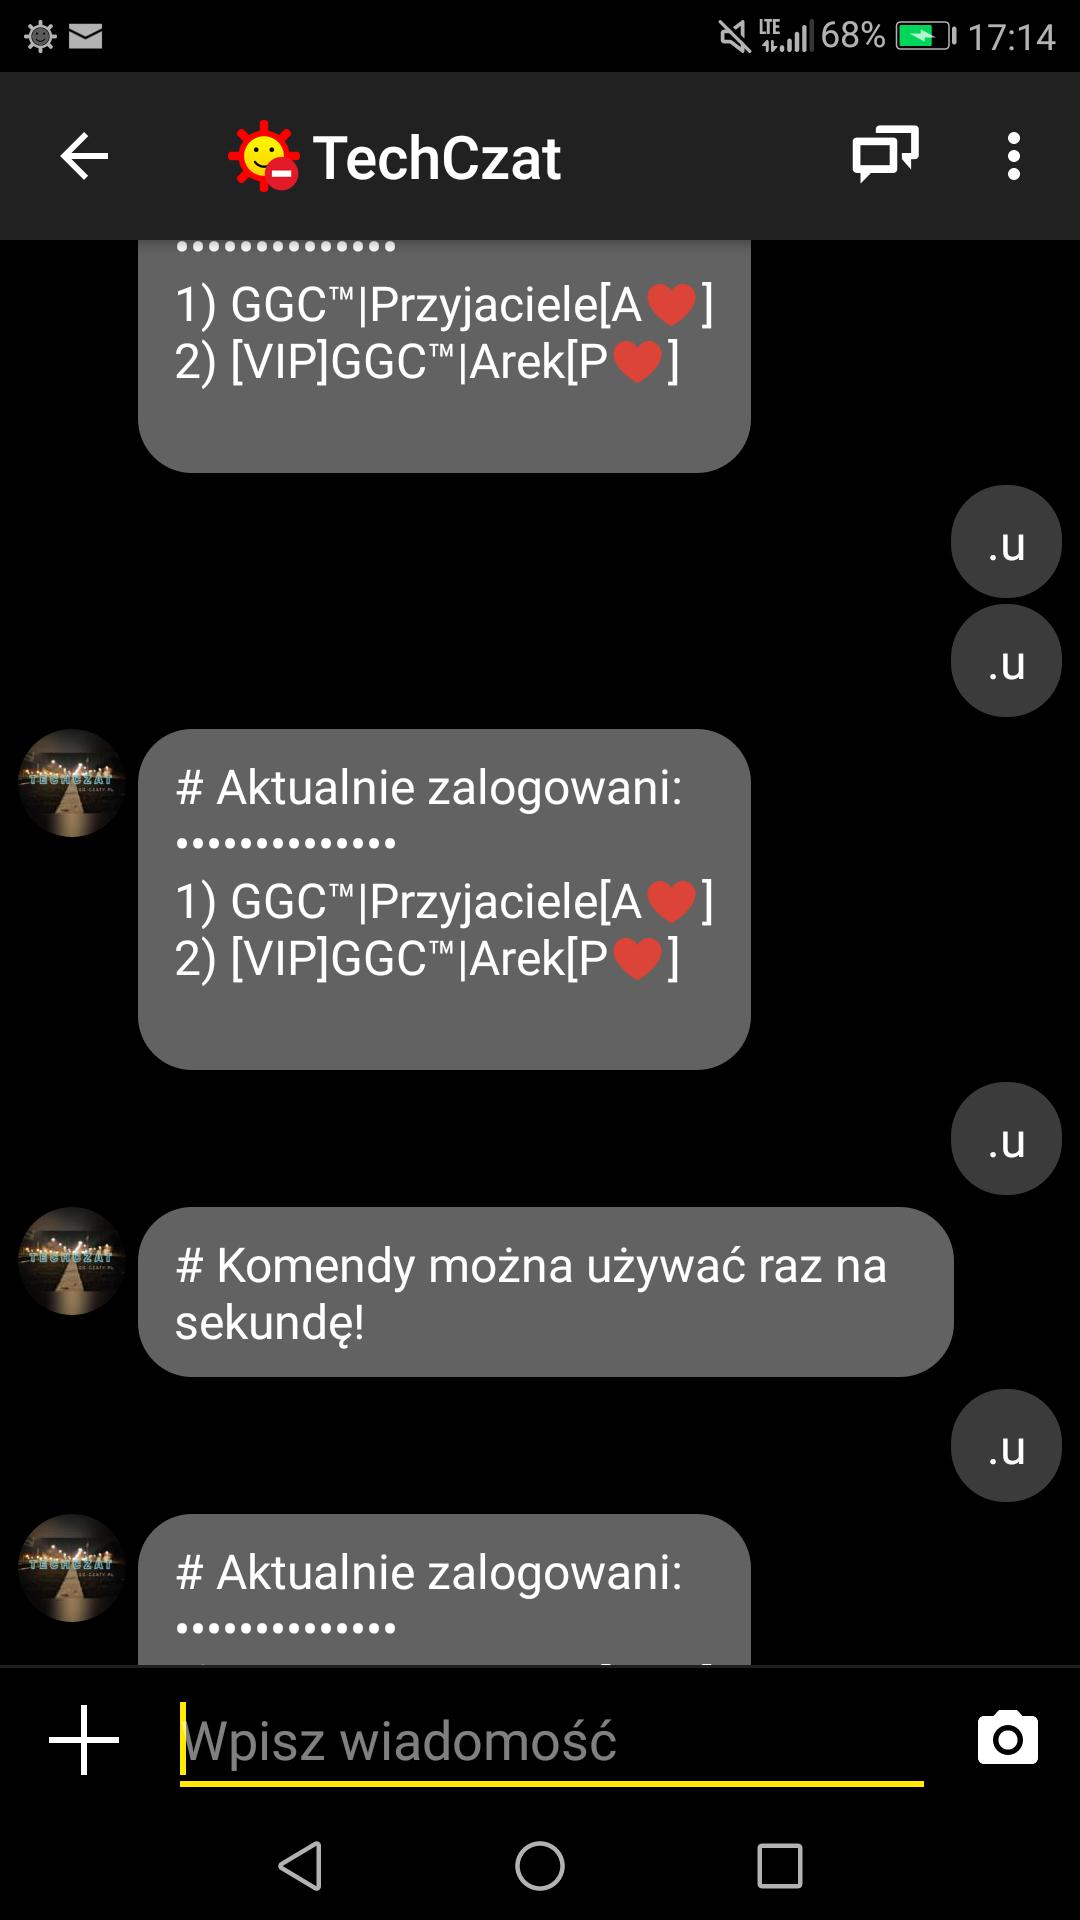 Screenshot_20180309-171440.png